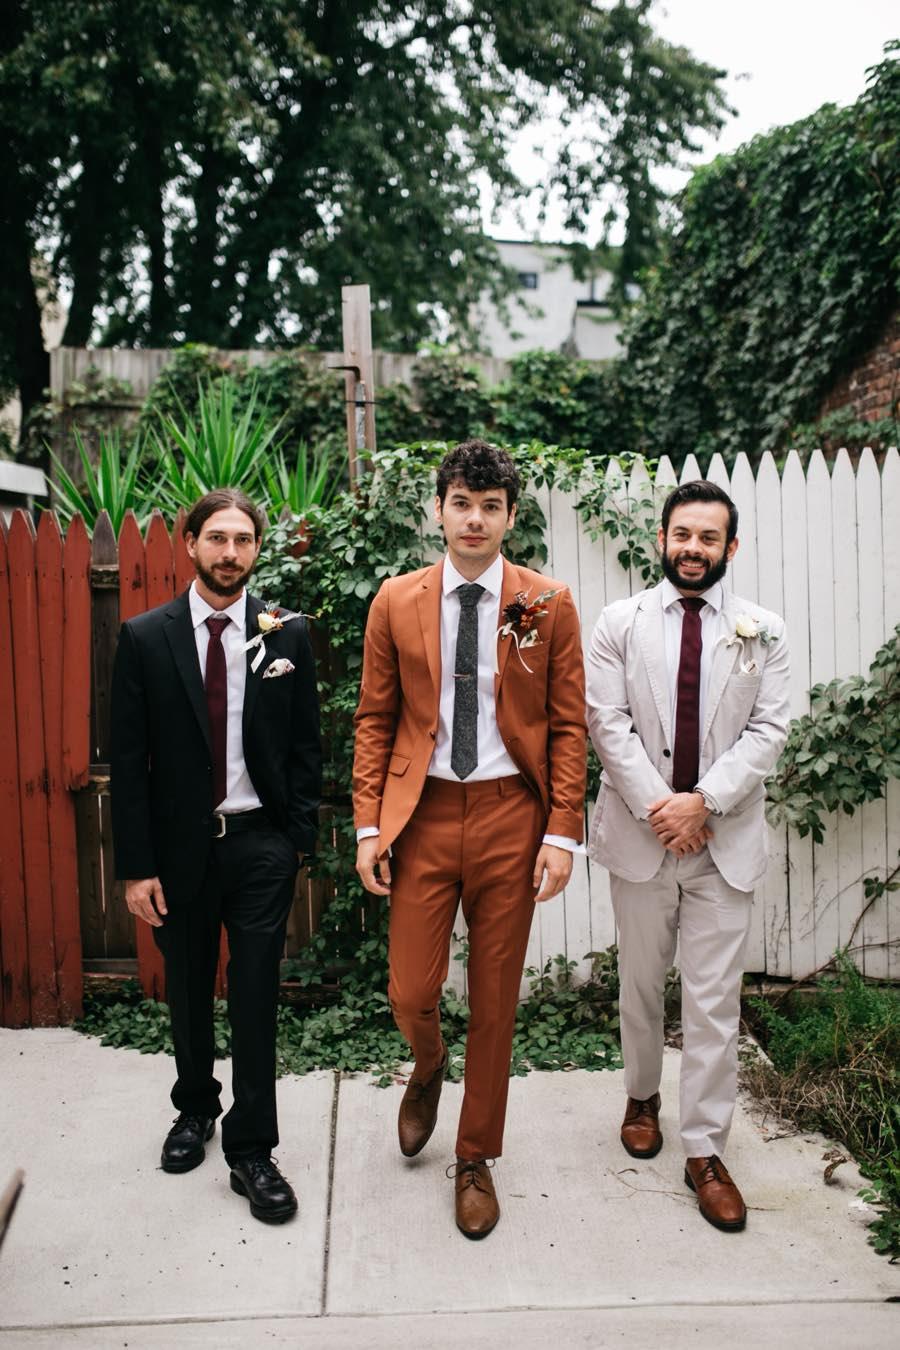 Hipster groom and groomsmen